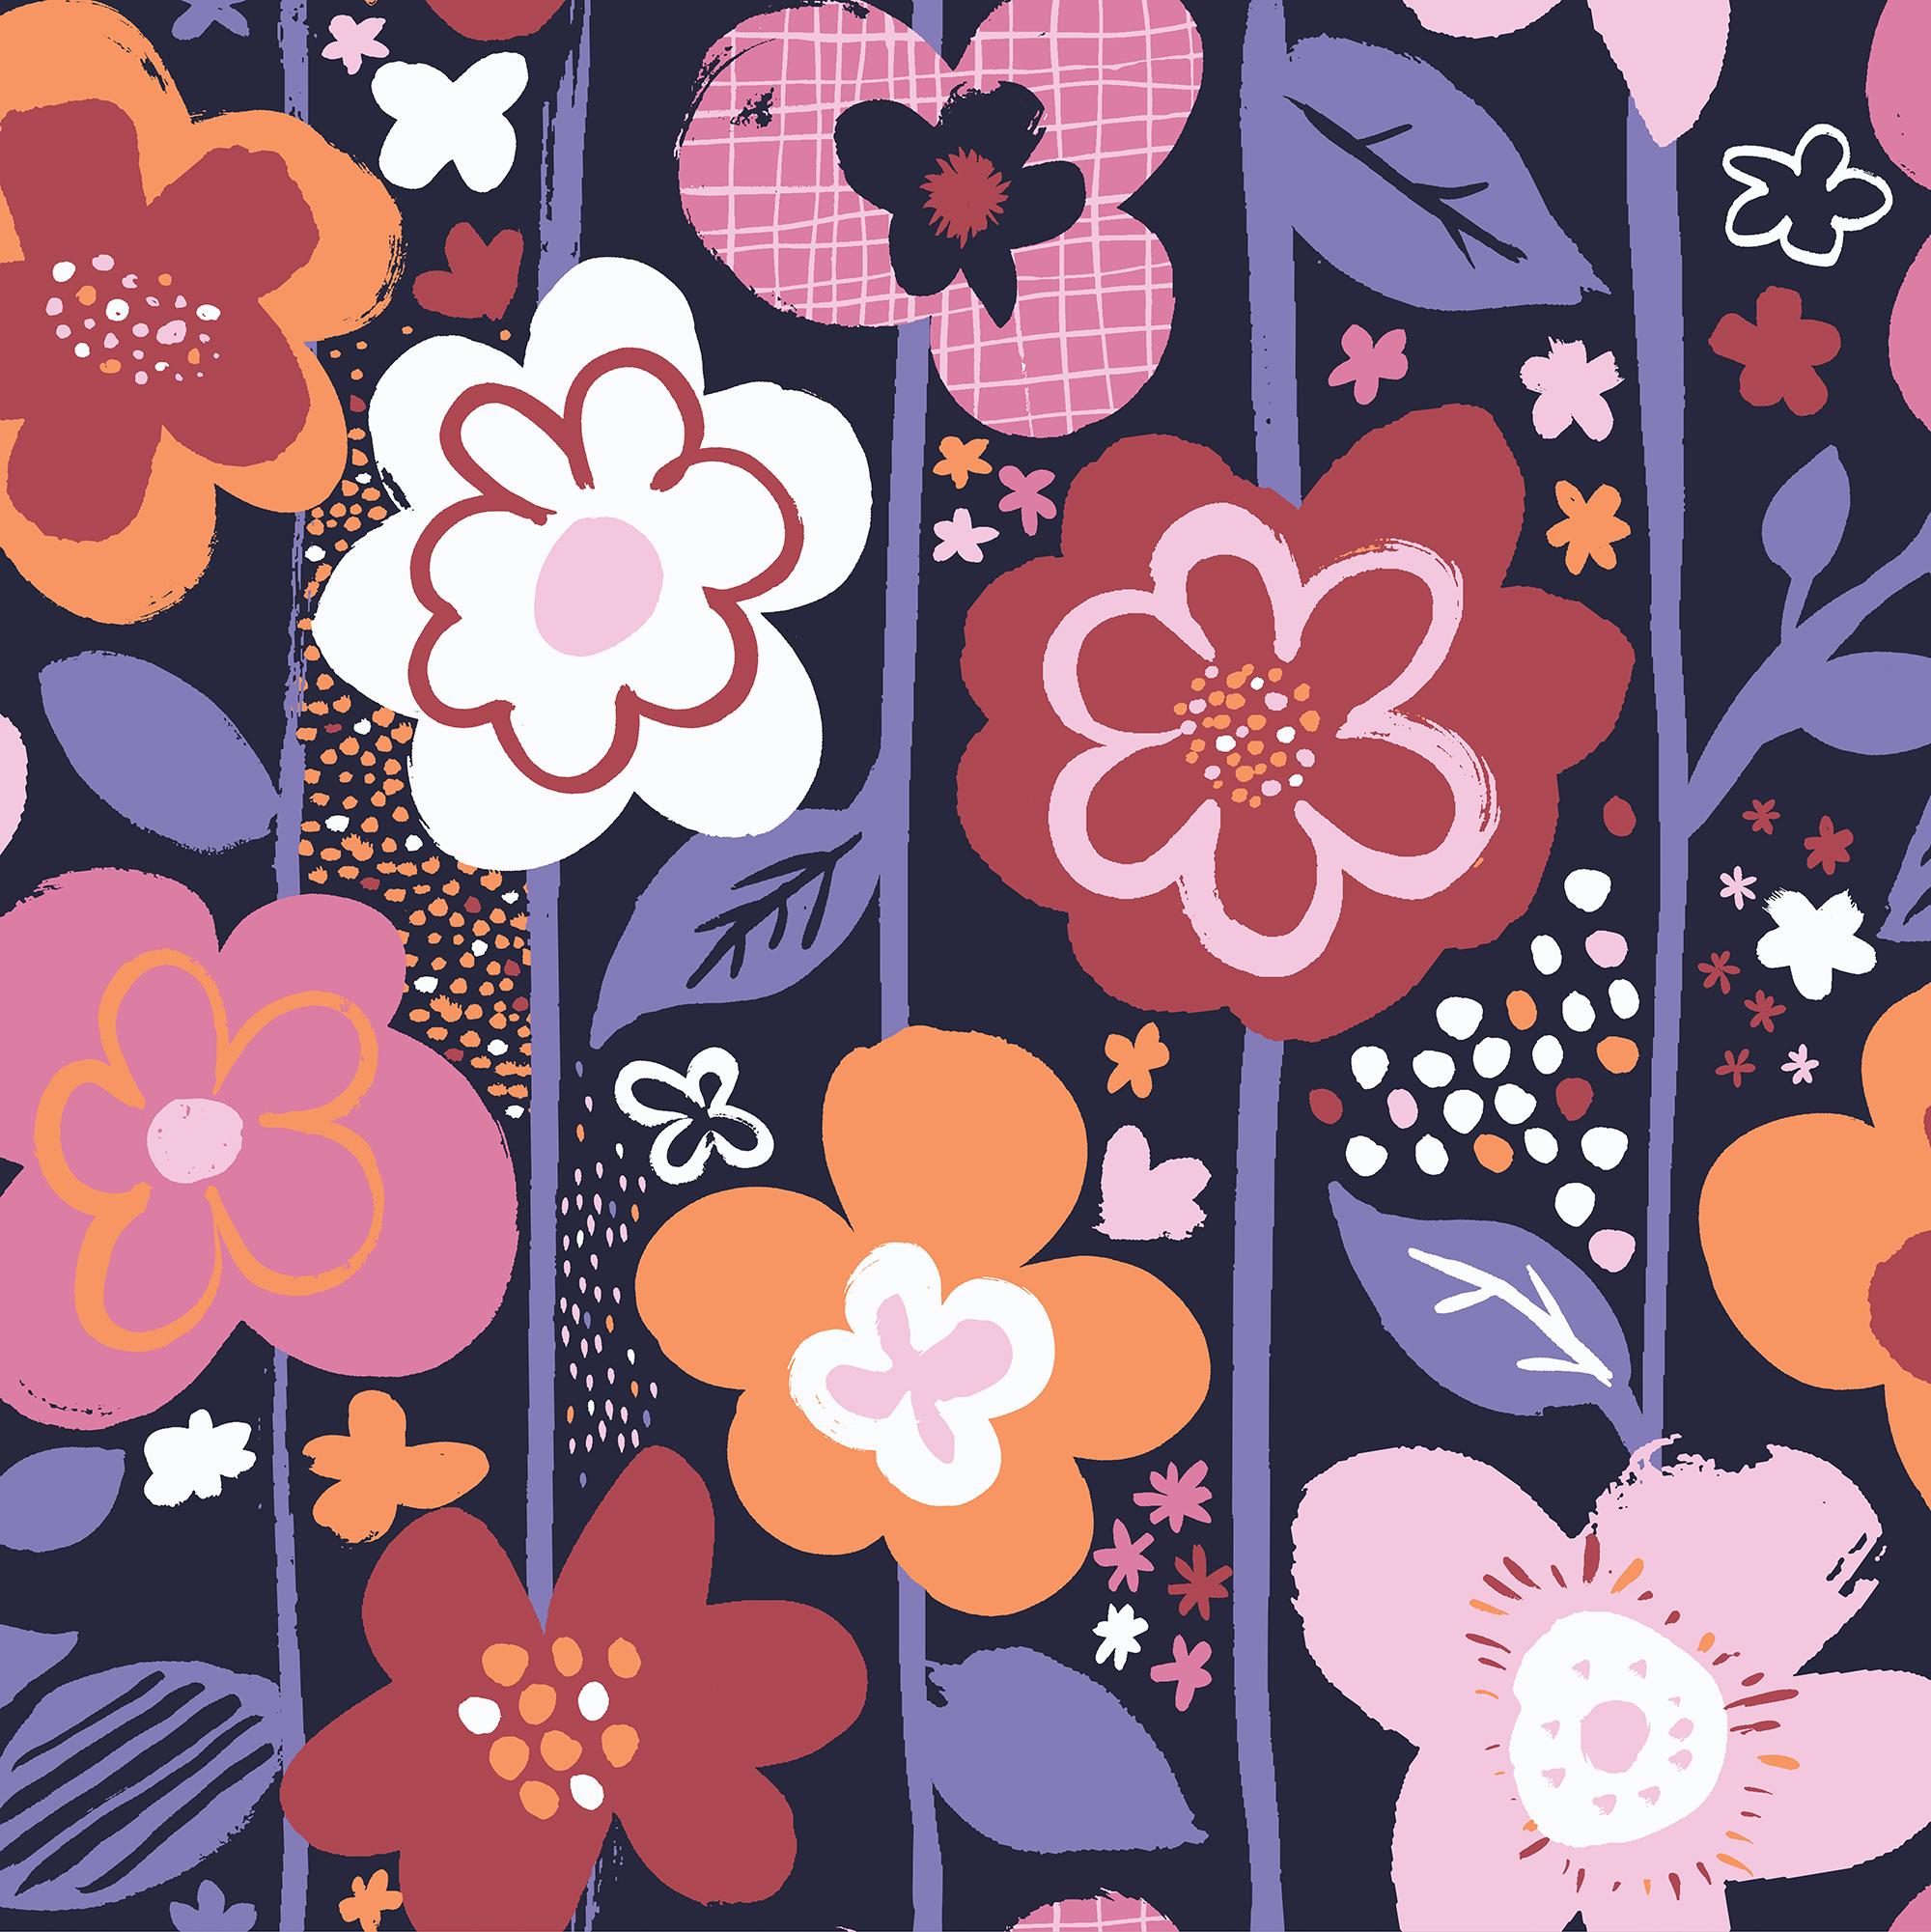 Repeat Patterns By Award Winning Illustrator Steph Calvert